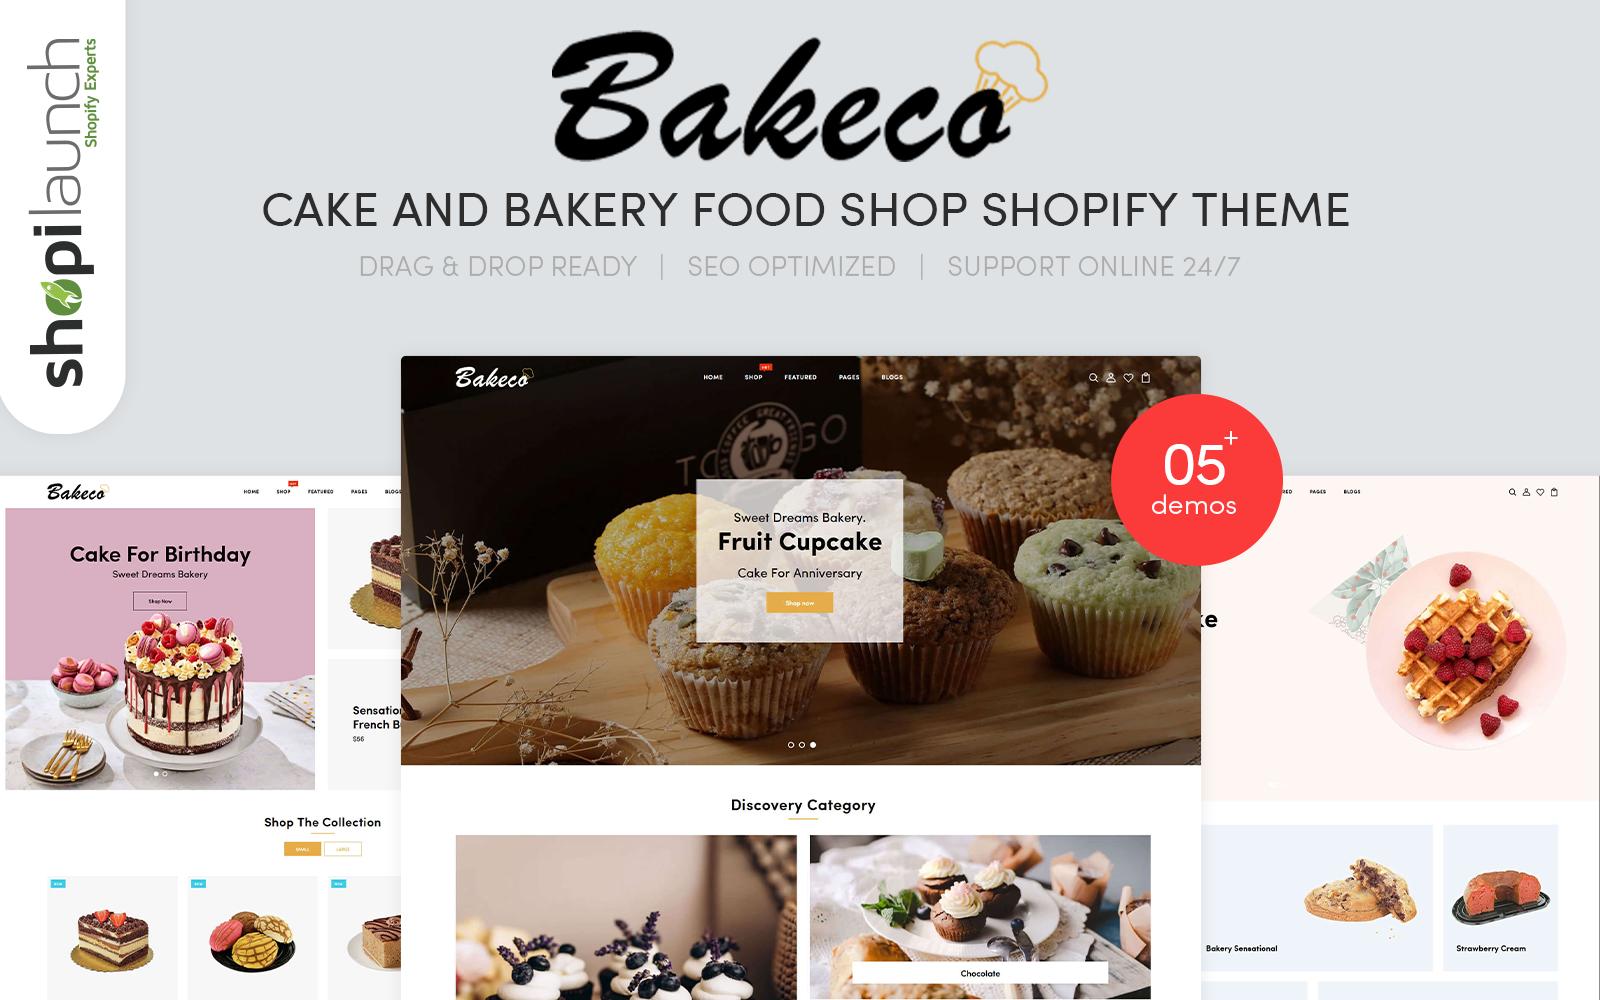 Bakeco - Cake & Bakery Food Shop Responsive Shopify Theme